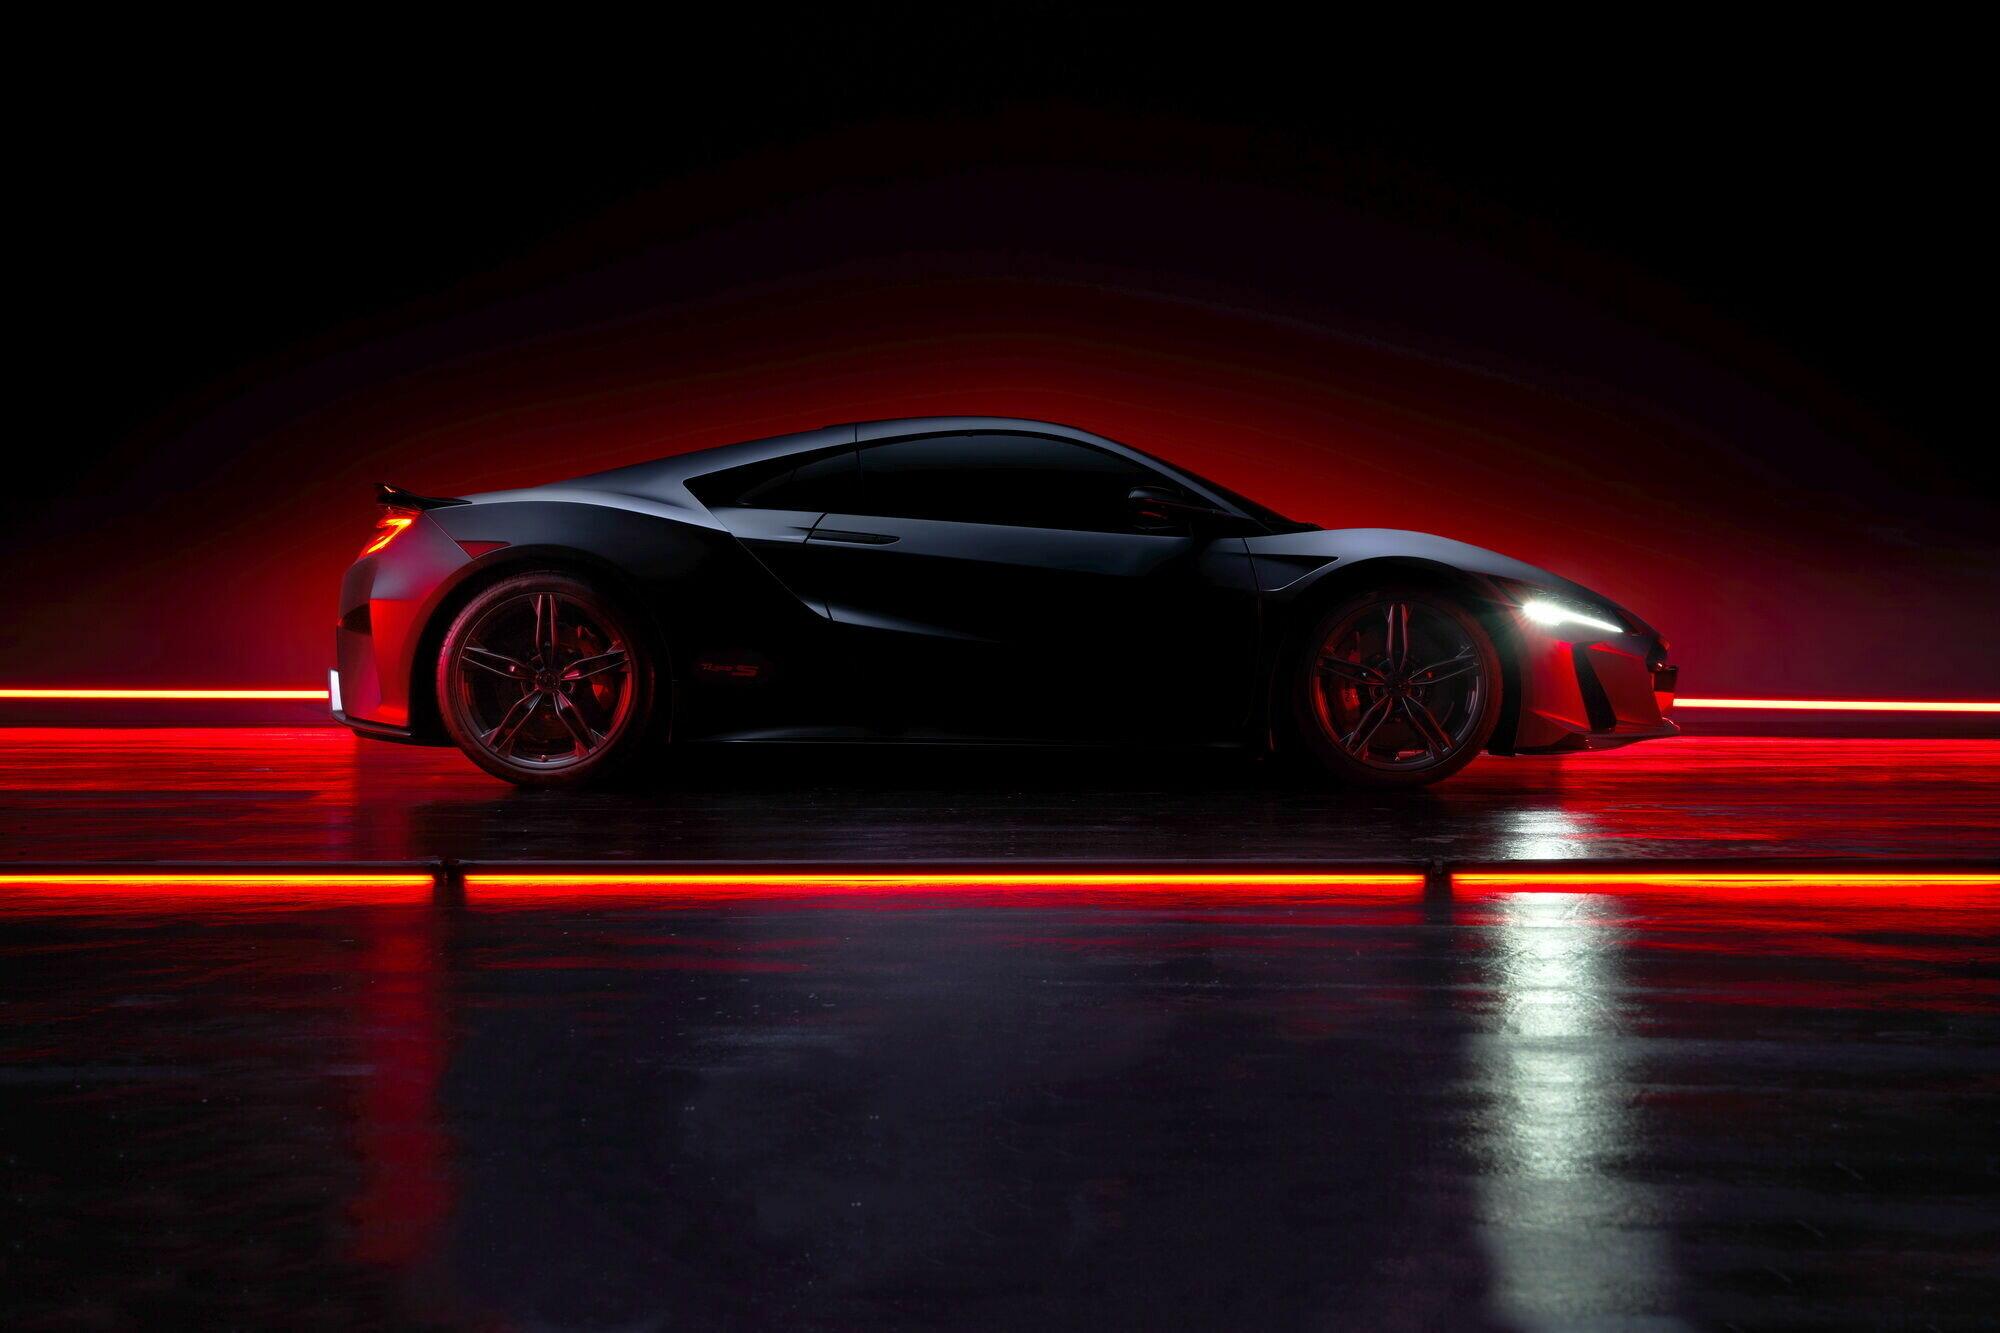 Acura выпустит лимитированную серию суперкара NSX Type S